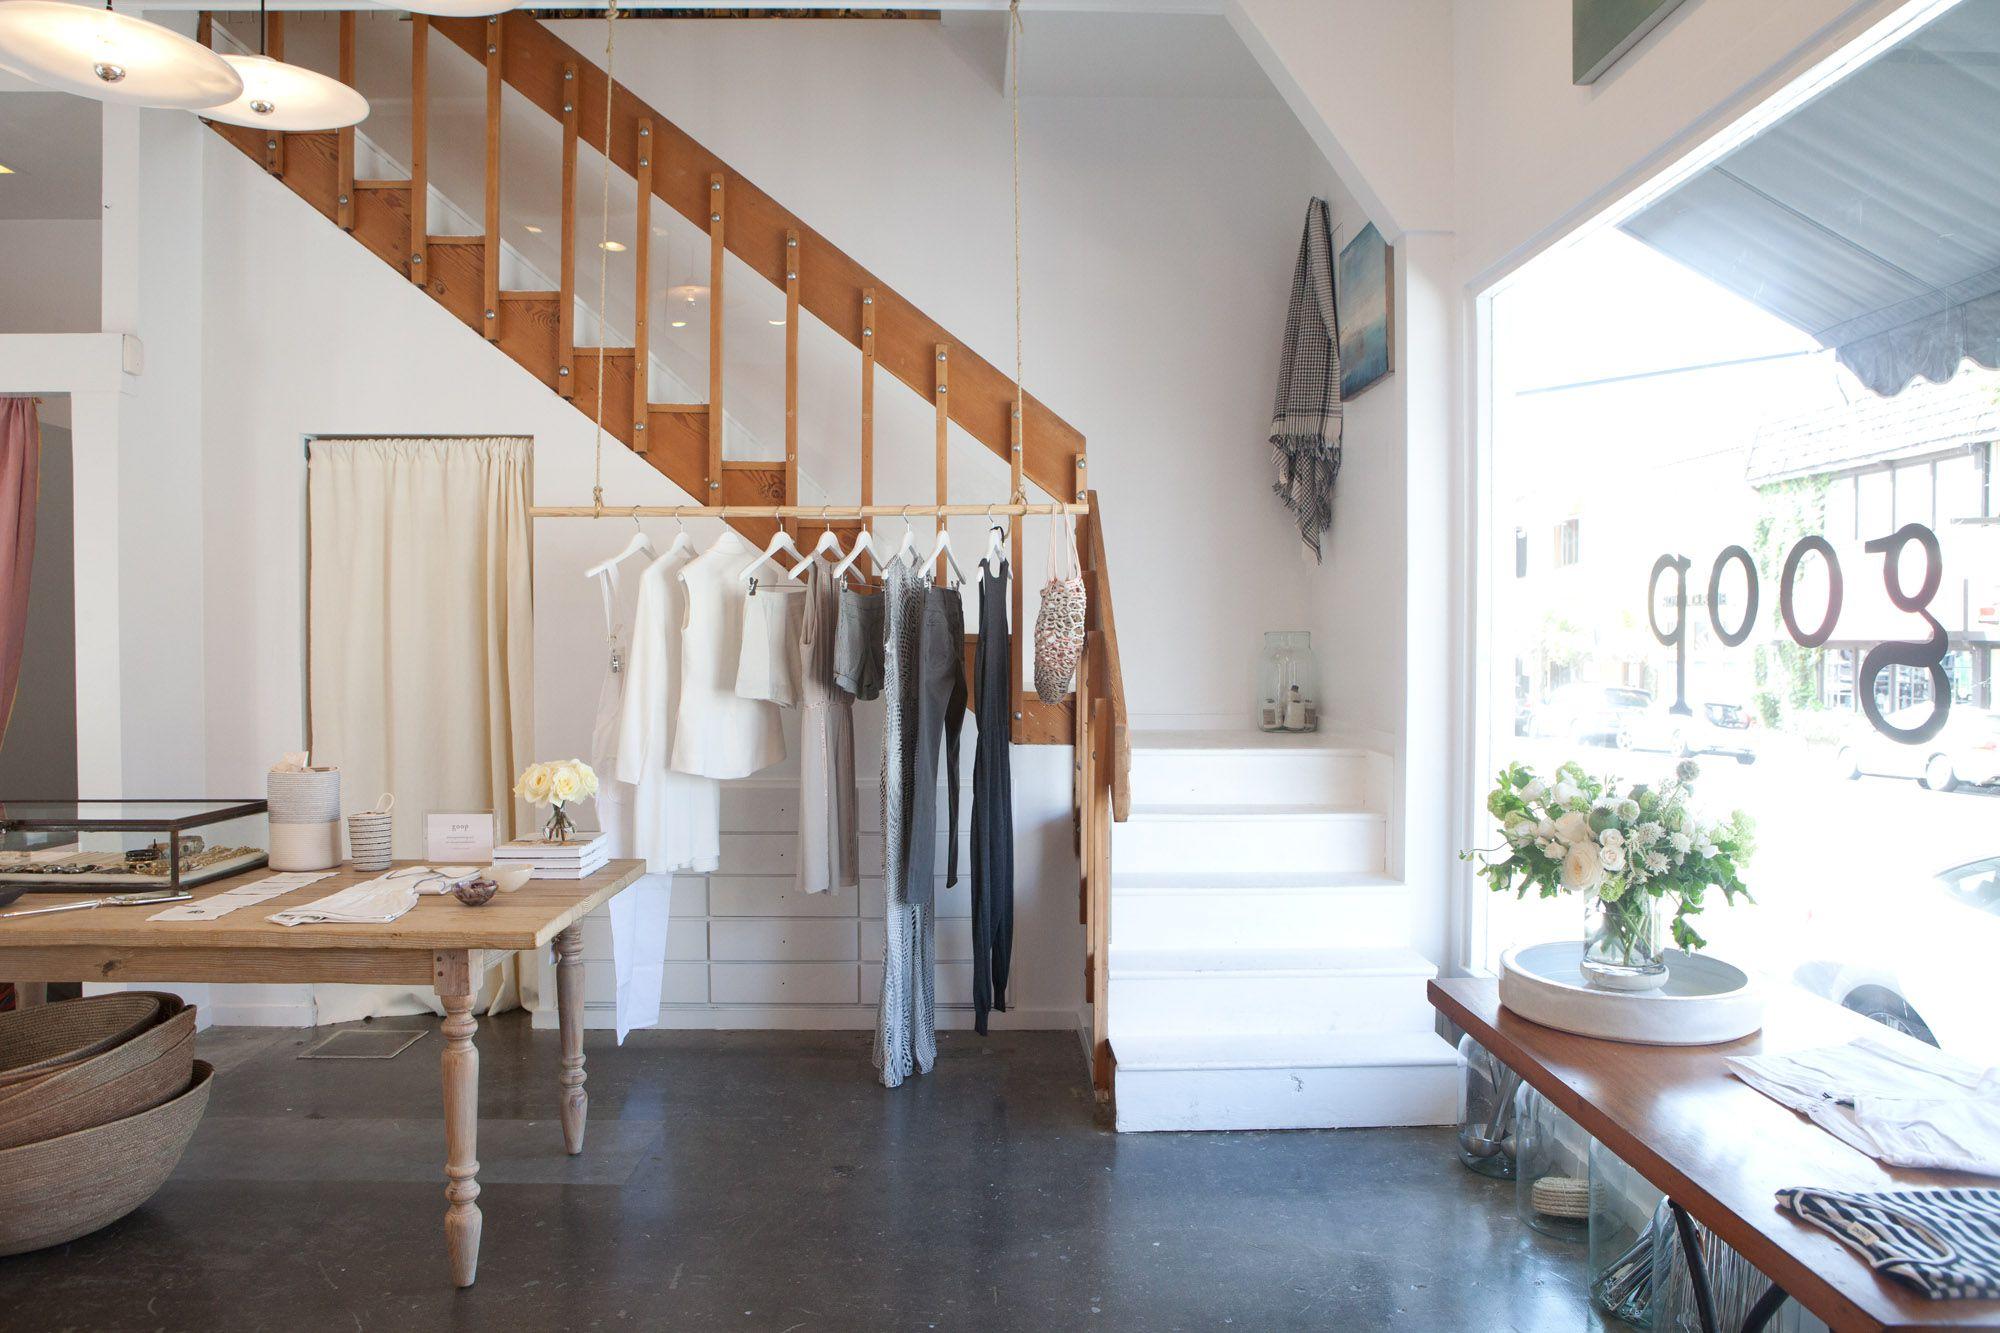 cara menata barang di toko bergaya modern minimalis